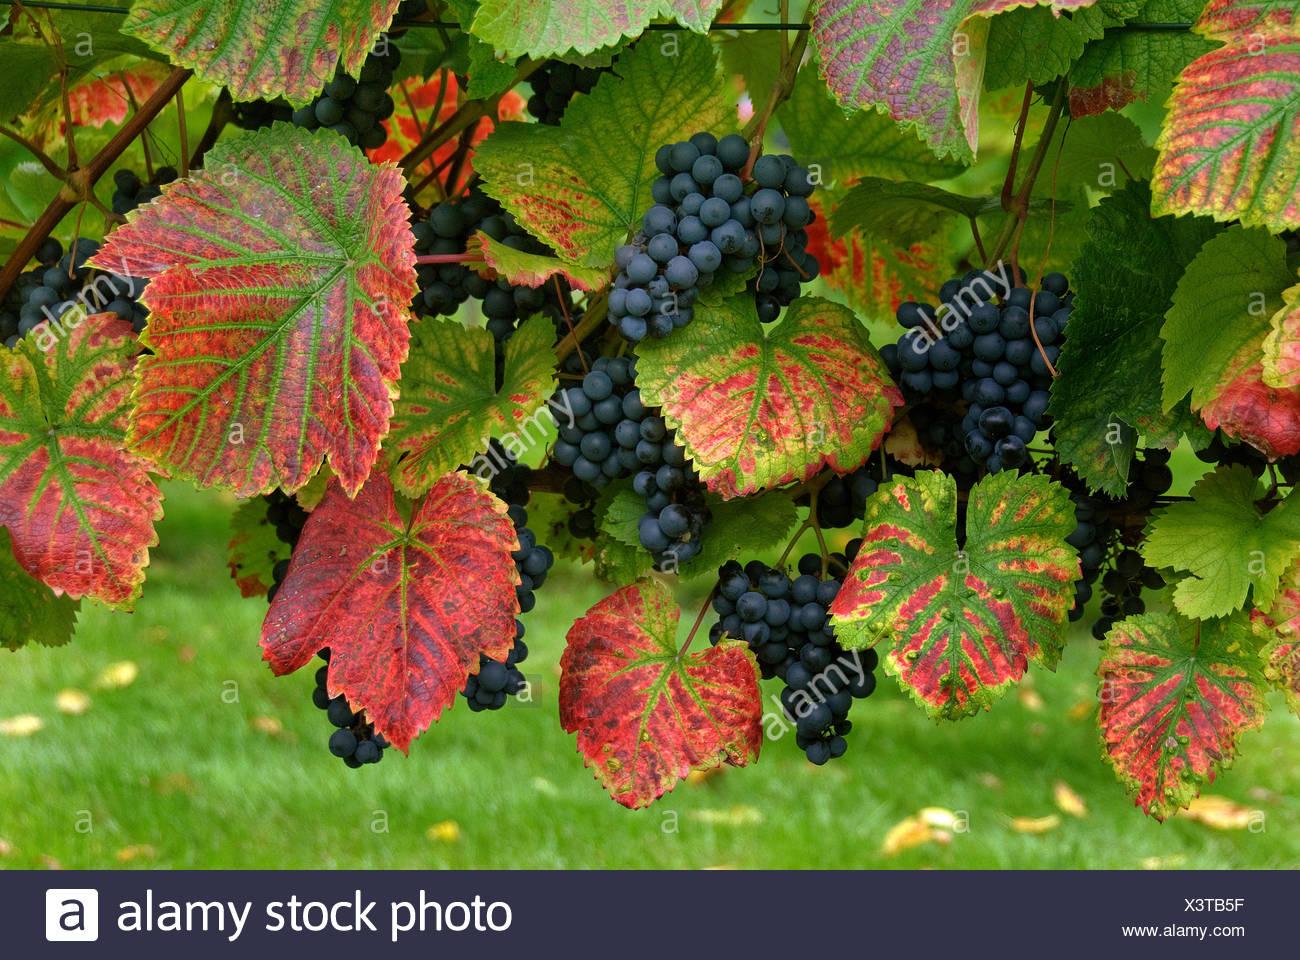 grape-vine, vine (Vitis vinifera 'Regent', Vitis vinifera Regent), cultivar Regent - Stock Image